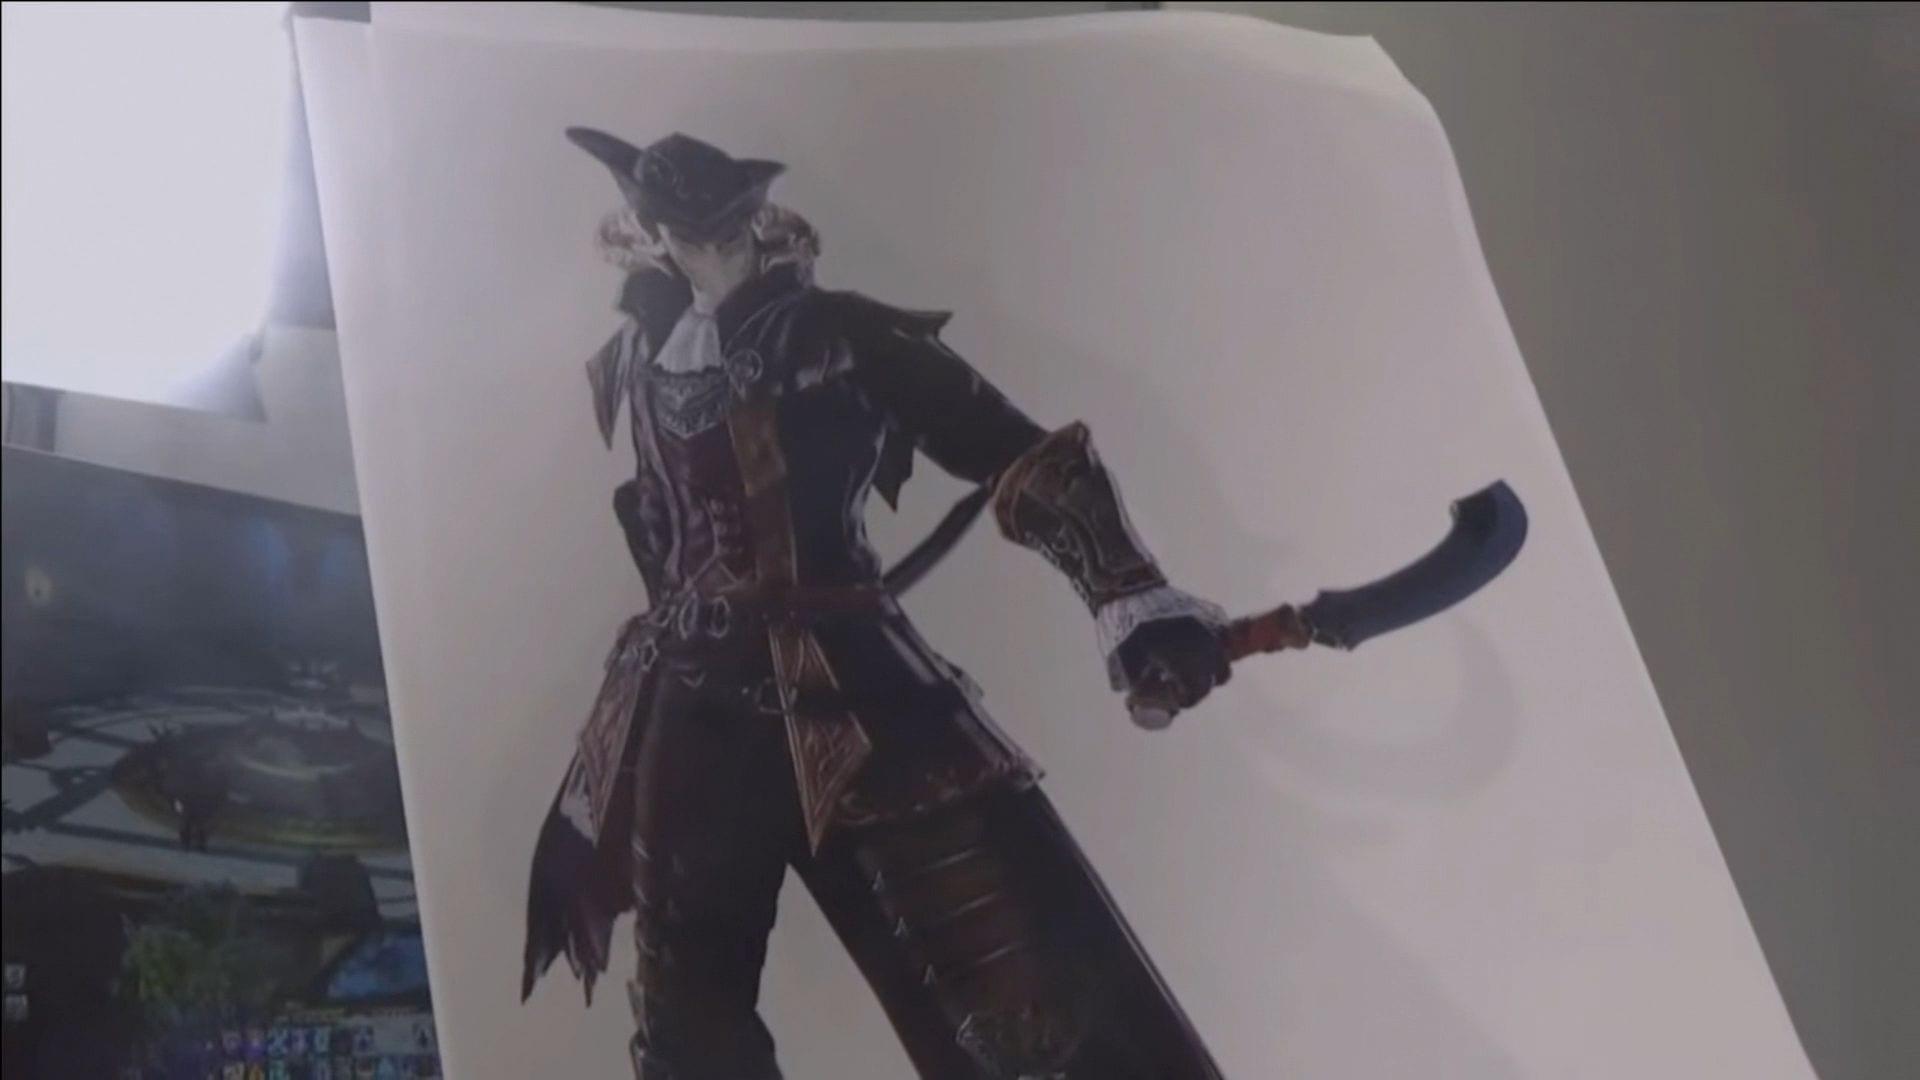 Final-Fantasy-XIV-Screenshot-2020-11-27-13-37-57.jpg